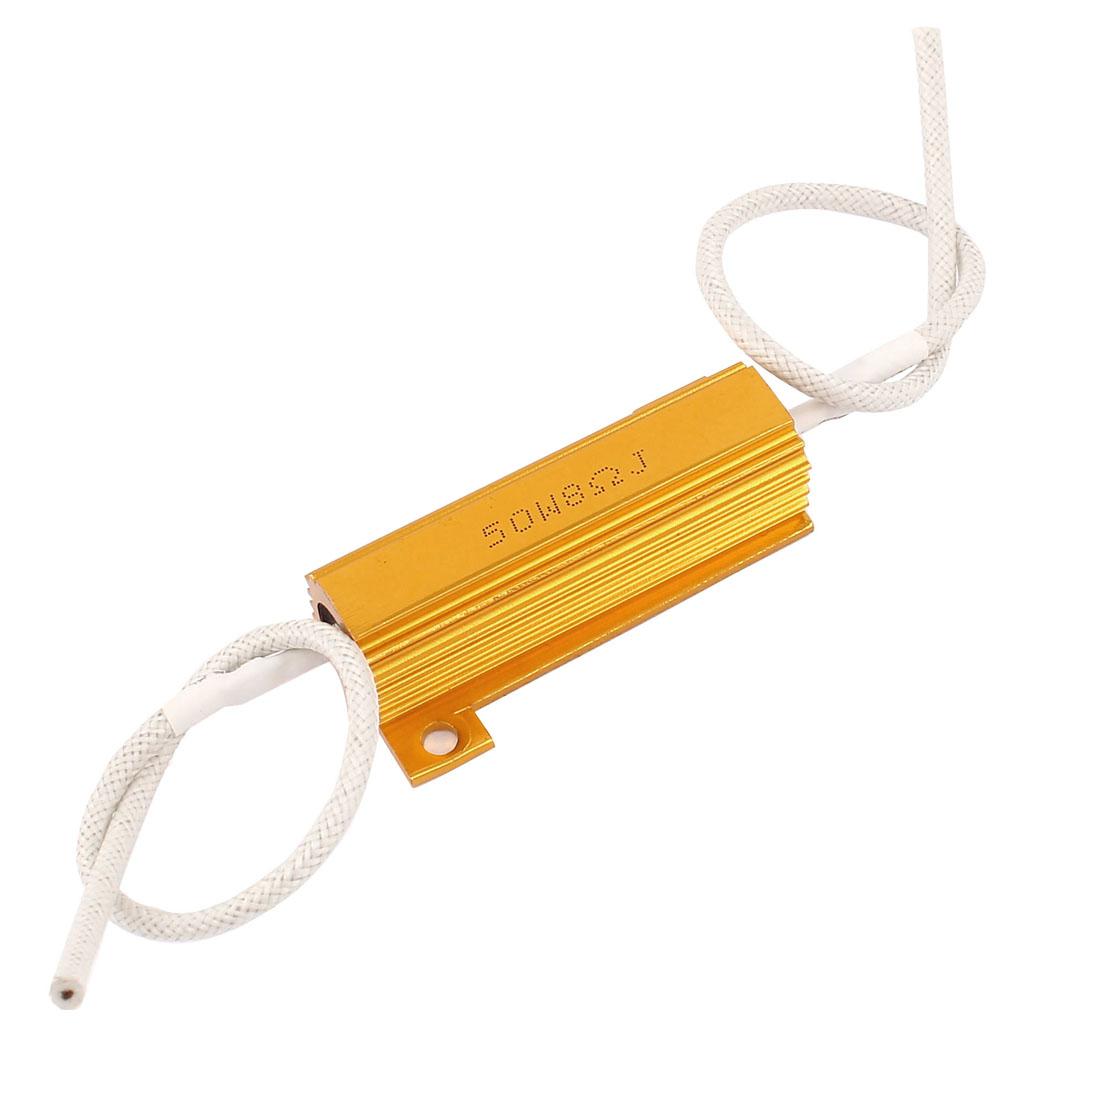 8Ohm 50W 5% Wirewound Car Loudspeaker Aluminum Clad Resistor